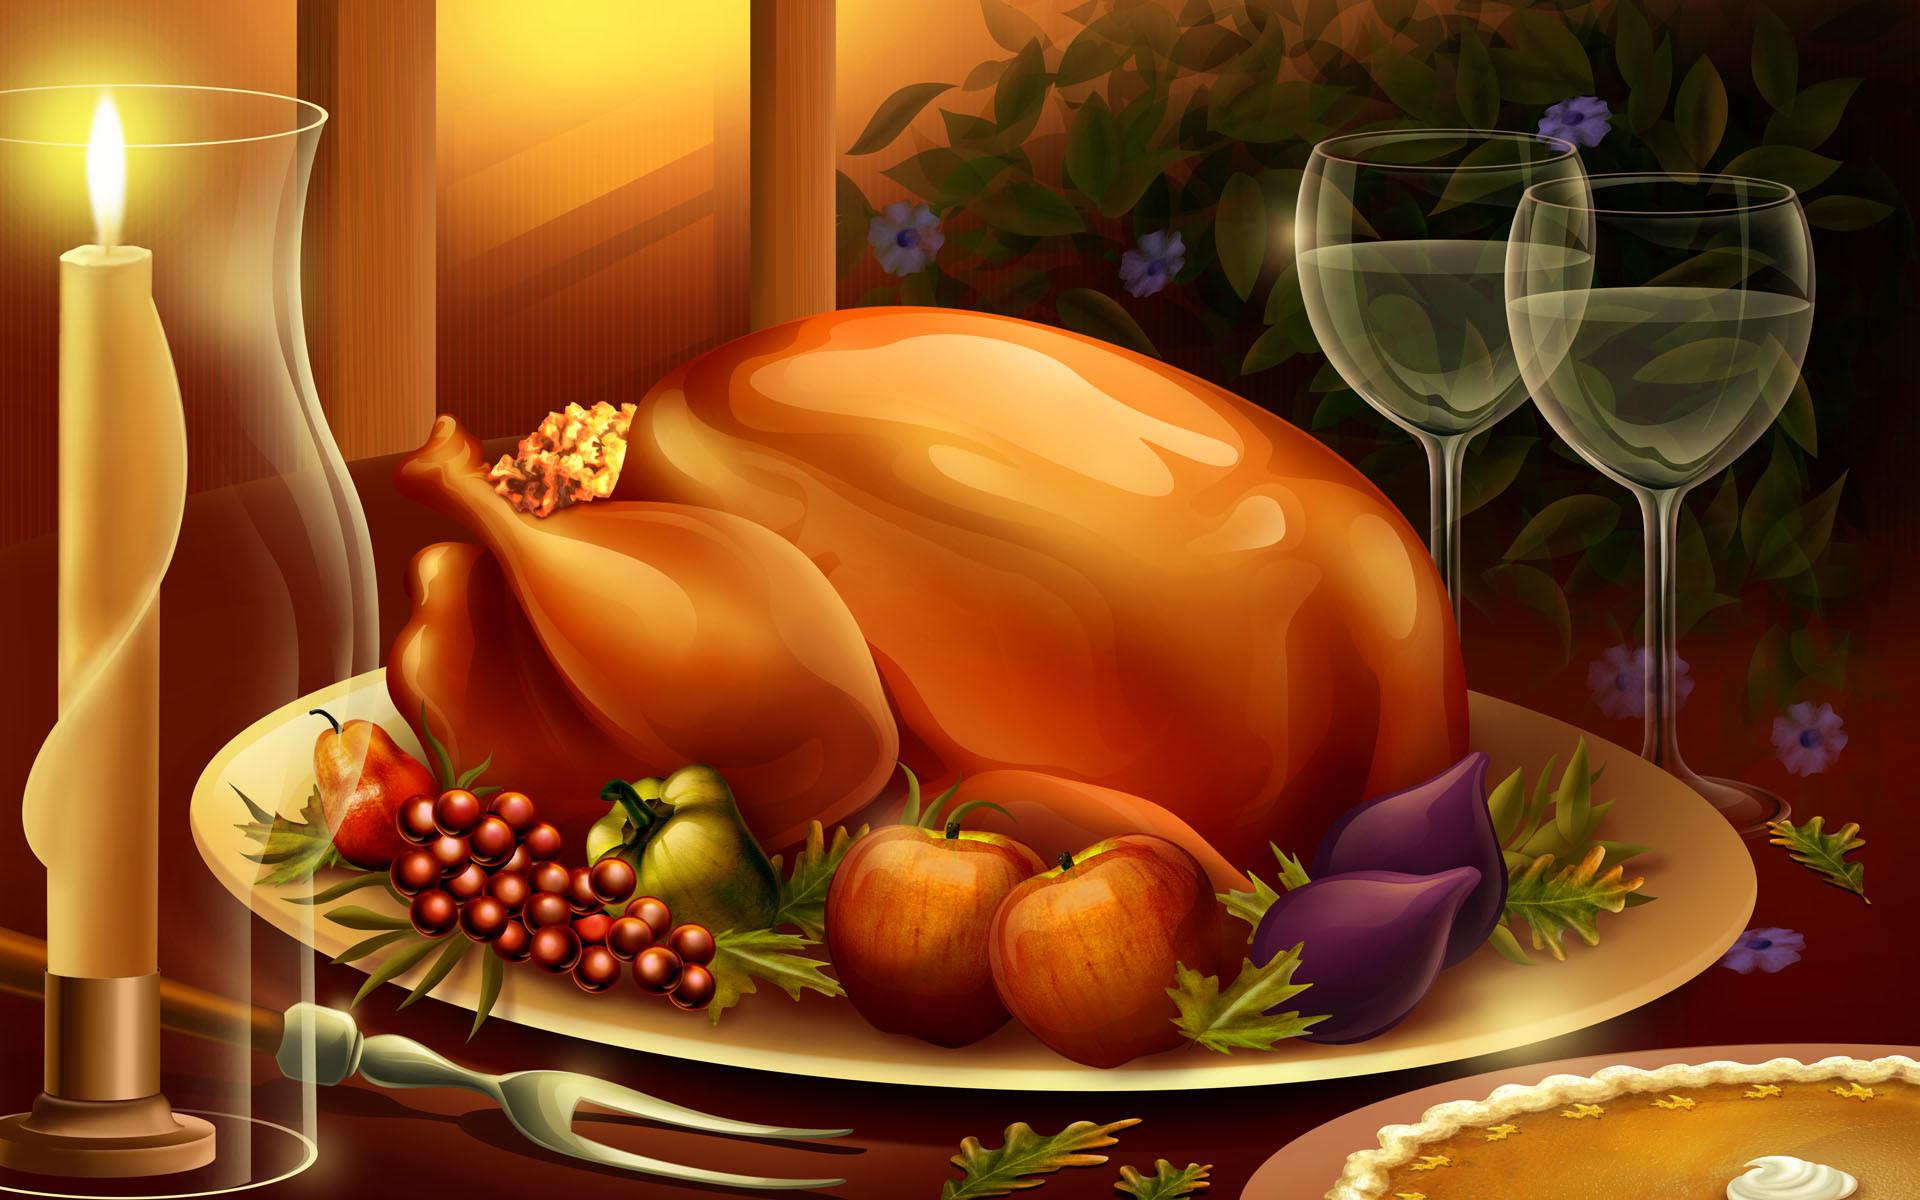 wallpaper, feast, thanksgiving, canadian, desktop